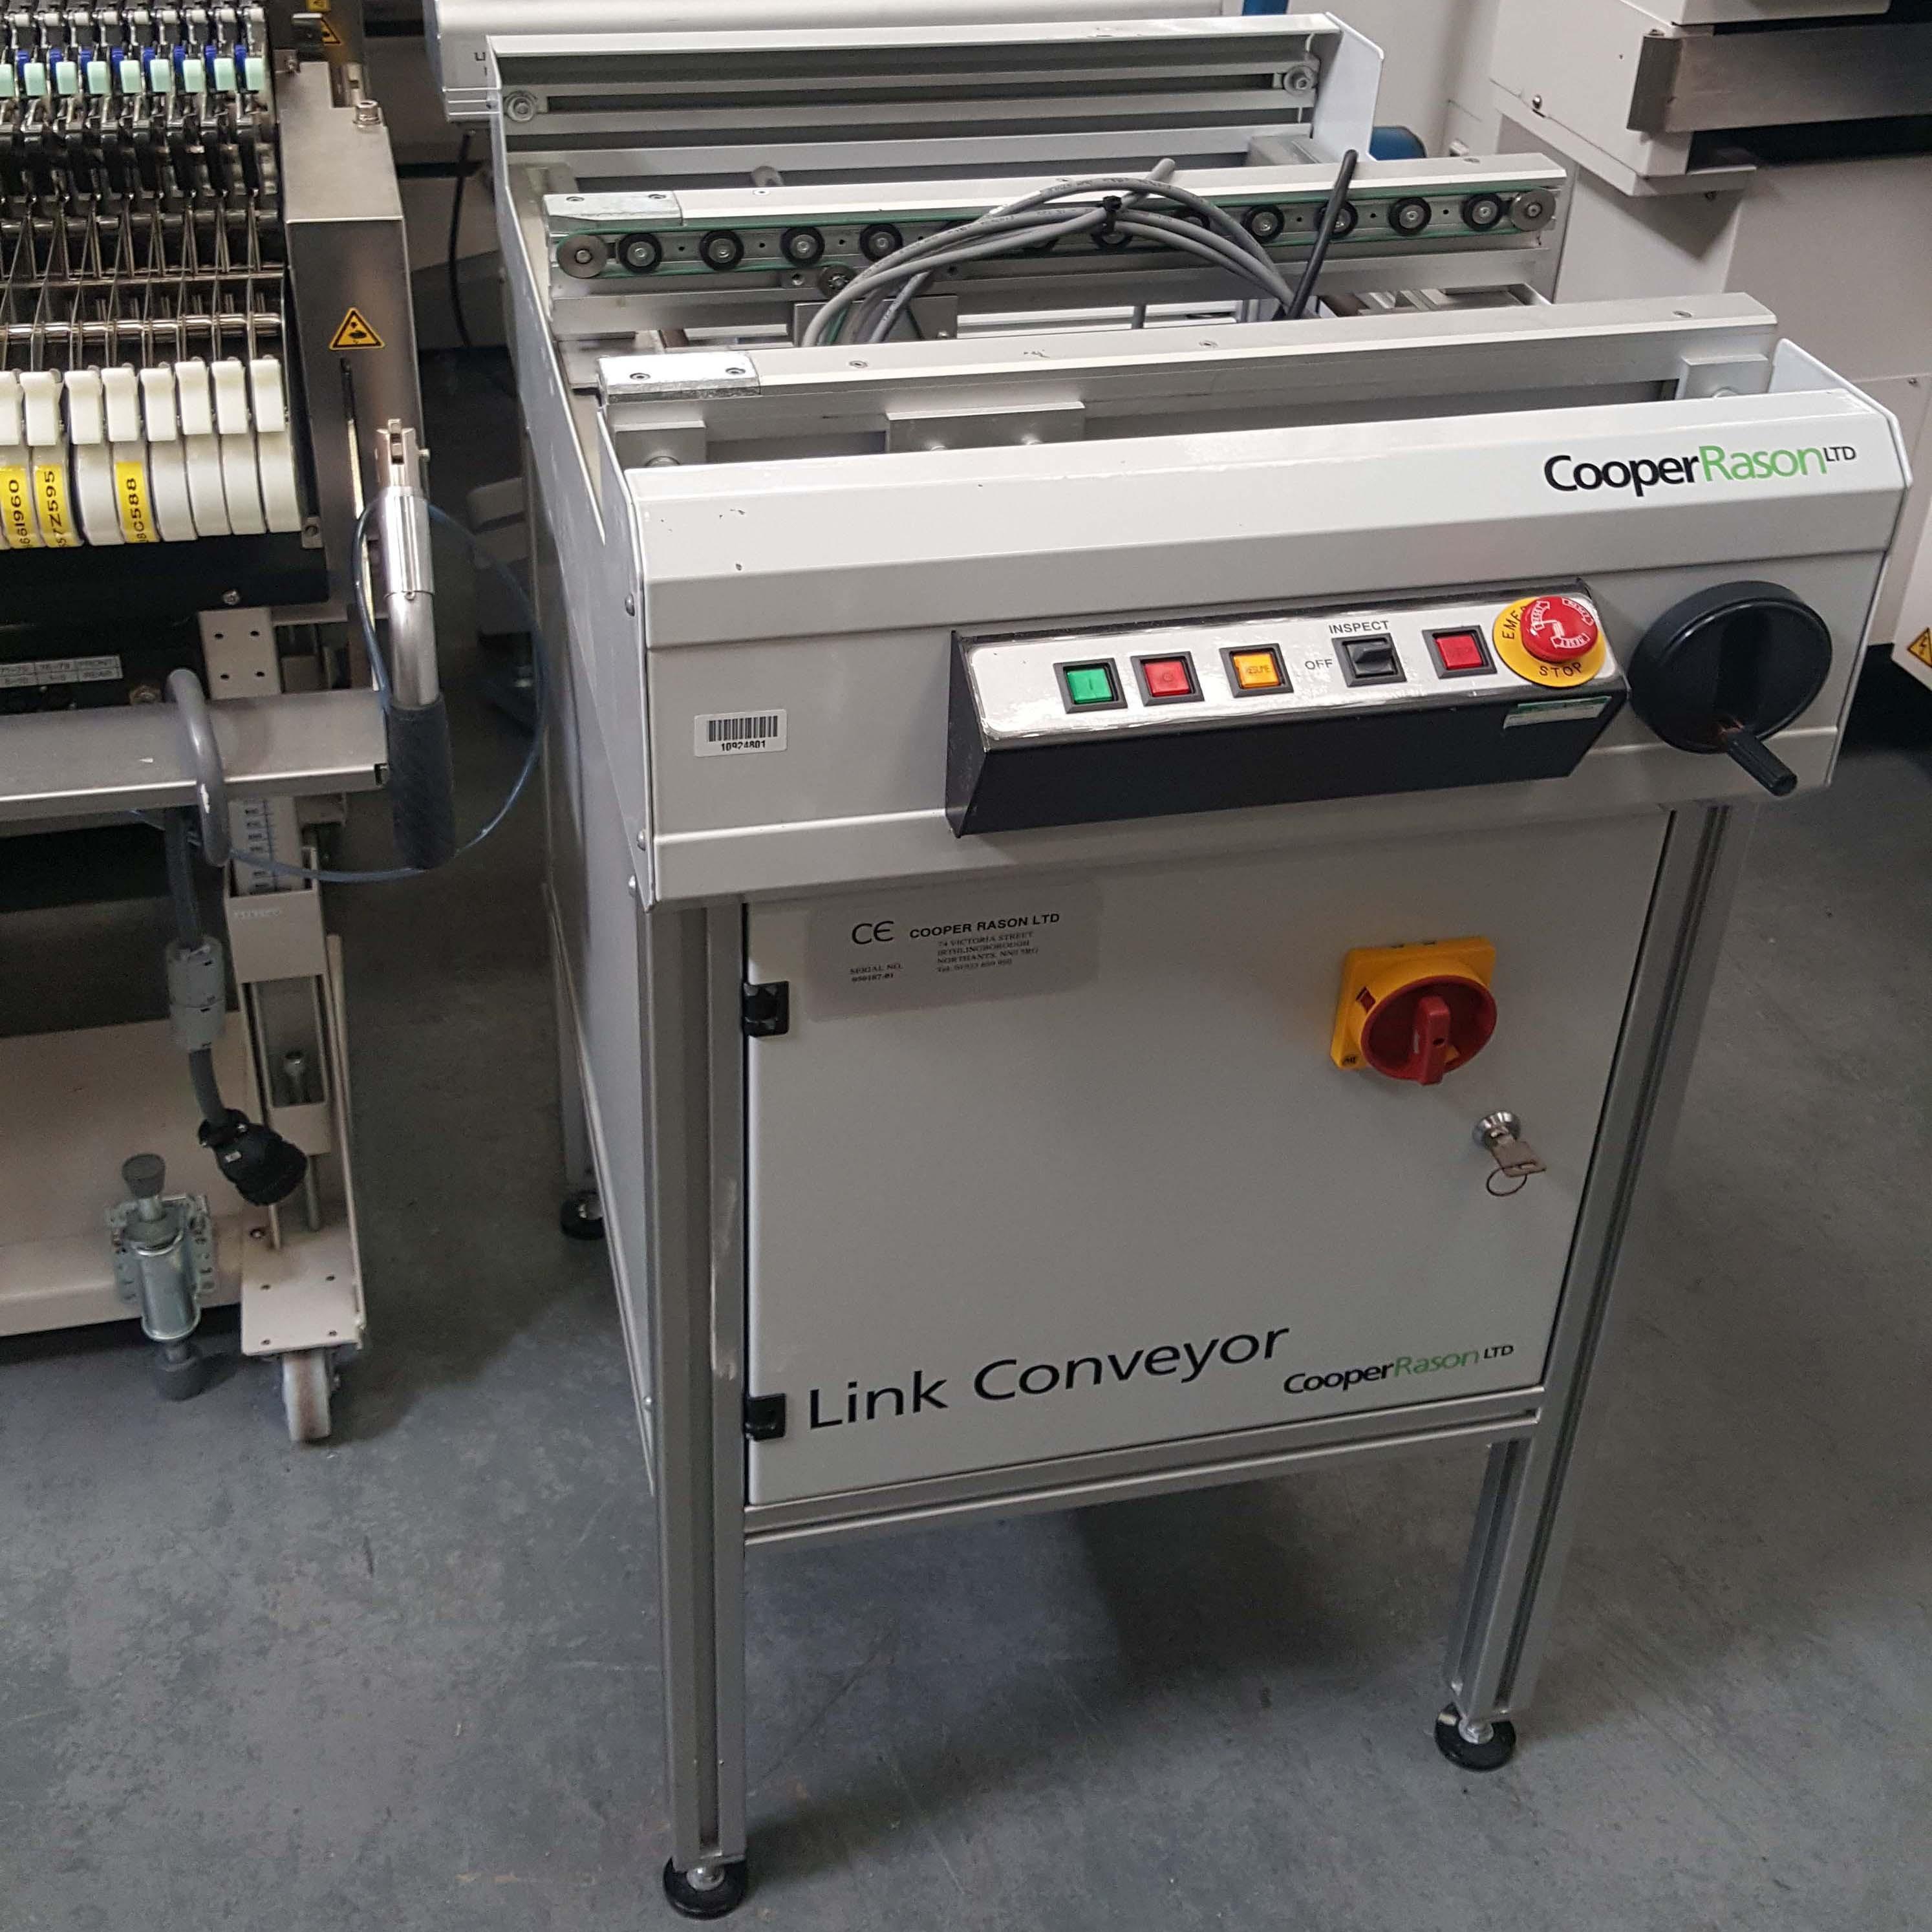 Cooper Rason 0.5M Conveyor